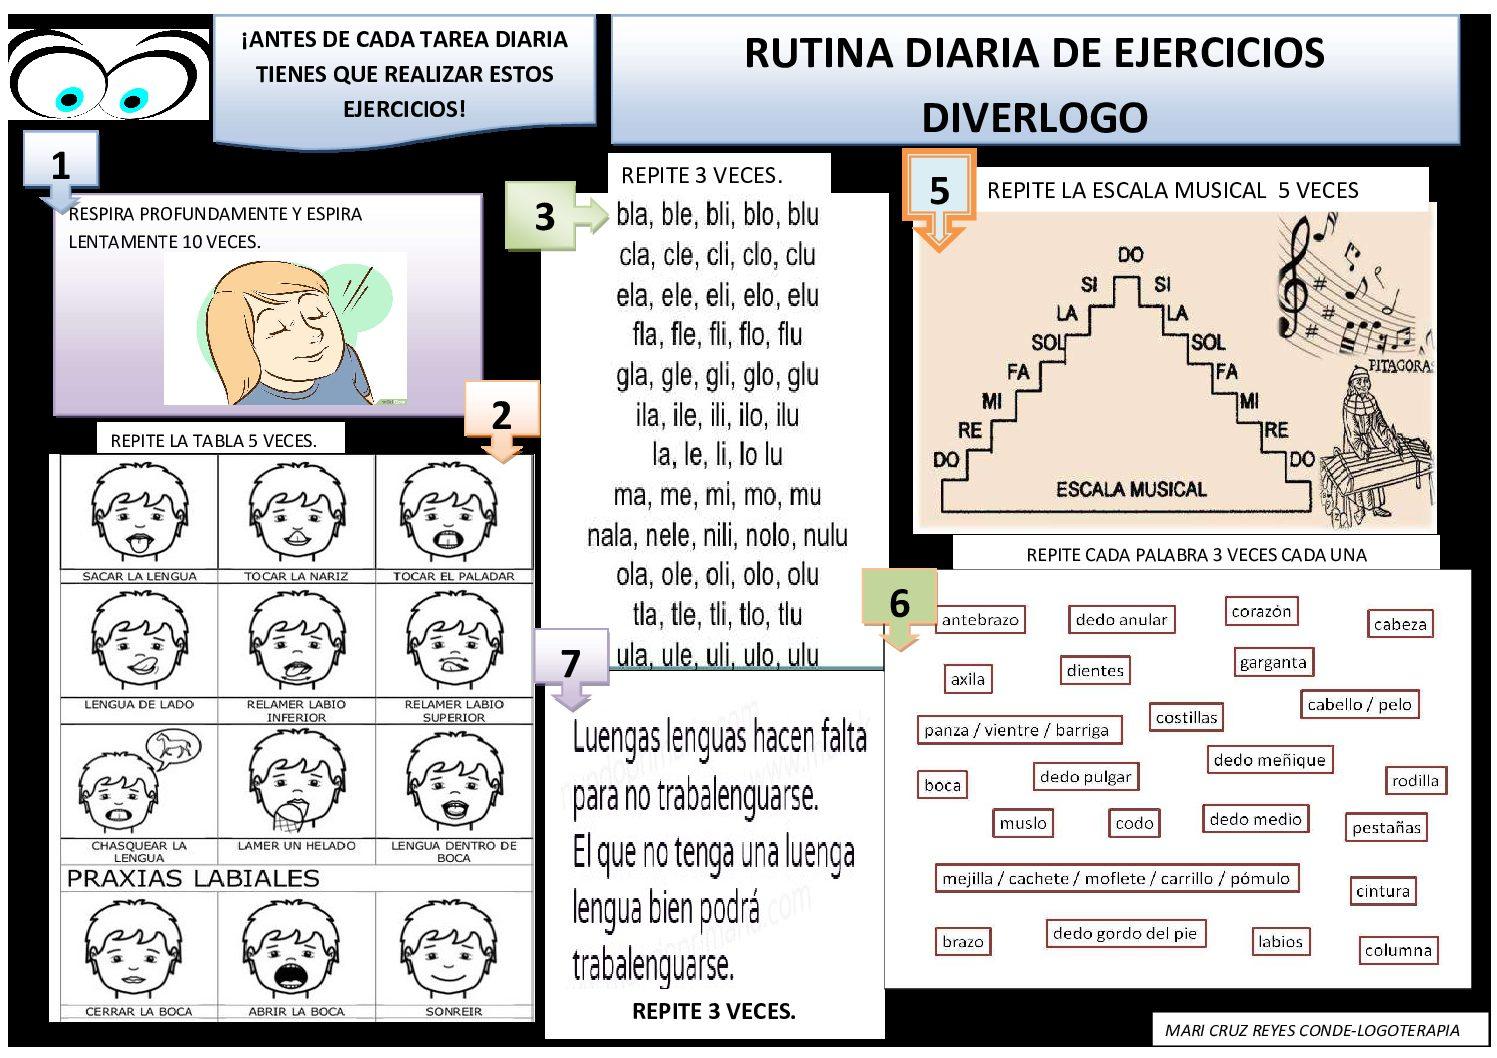 RUTINA-DIARIA-DE-EJERCICIOS-LOGO-pdf[1]